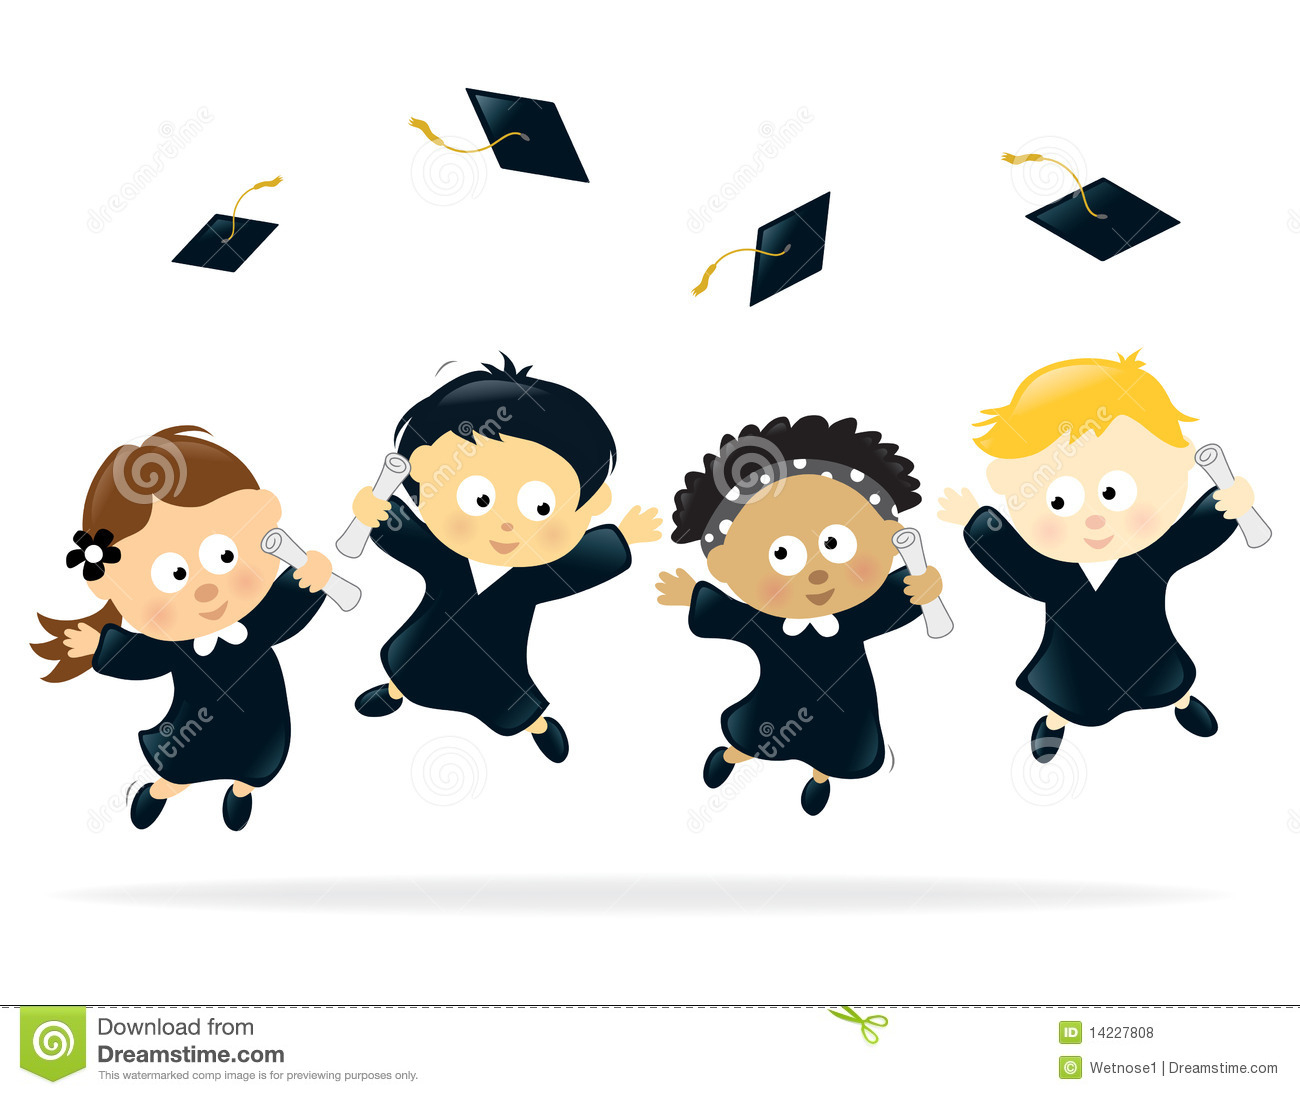 Preschool Graduation Clip Art Free Clipart Collection - Free Printable Kindergarten Graduation Clipart